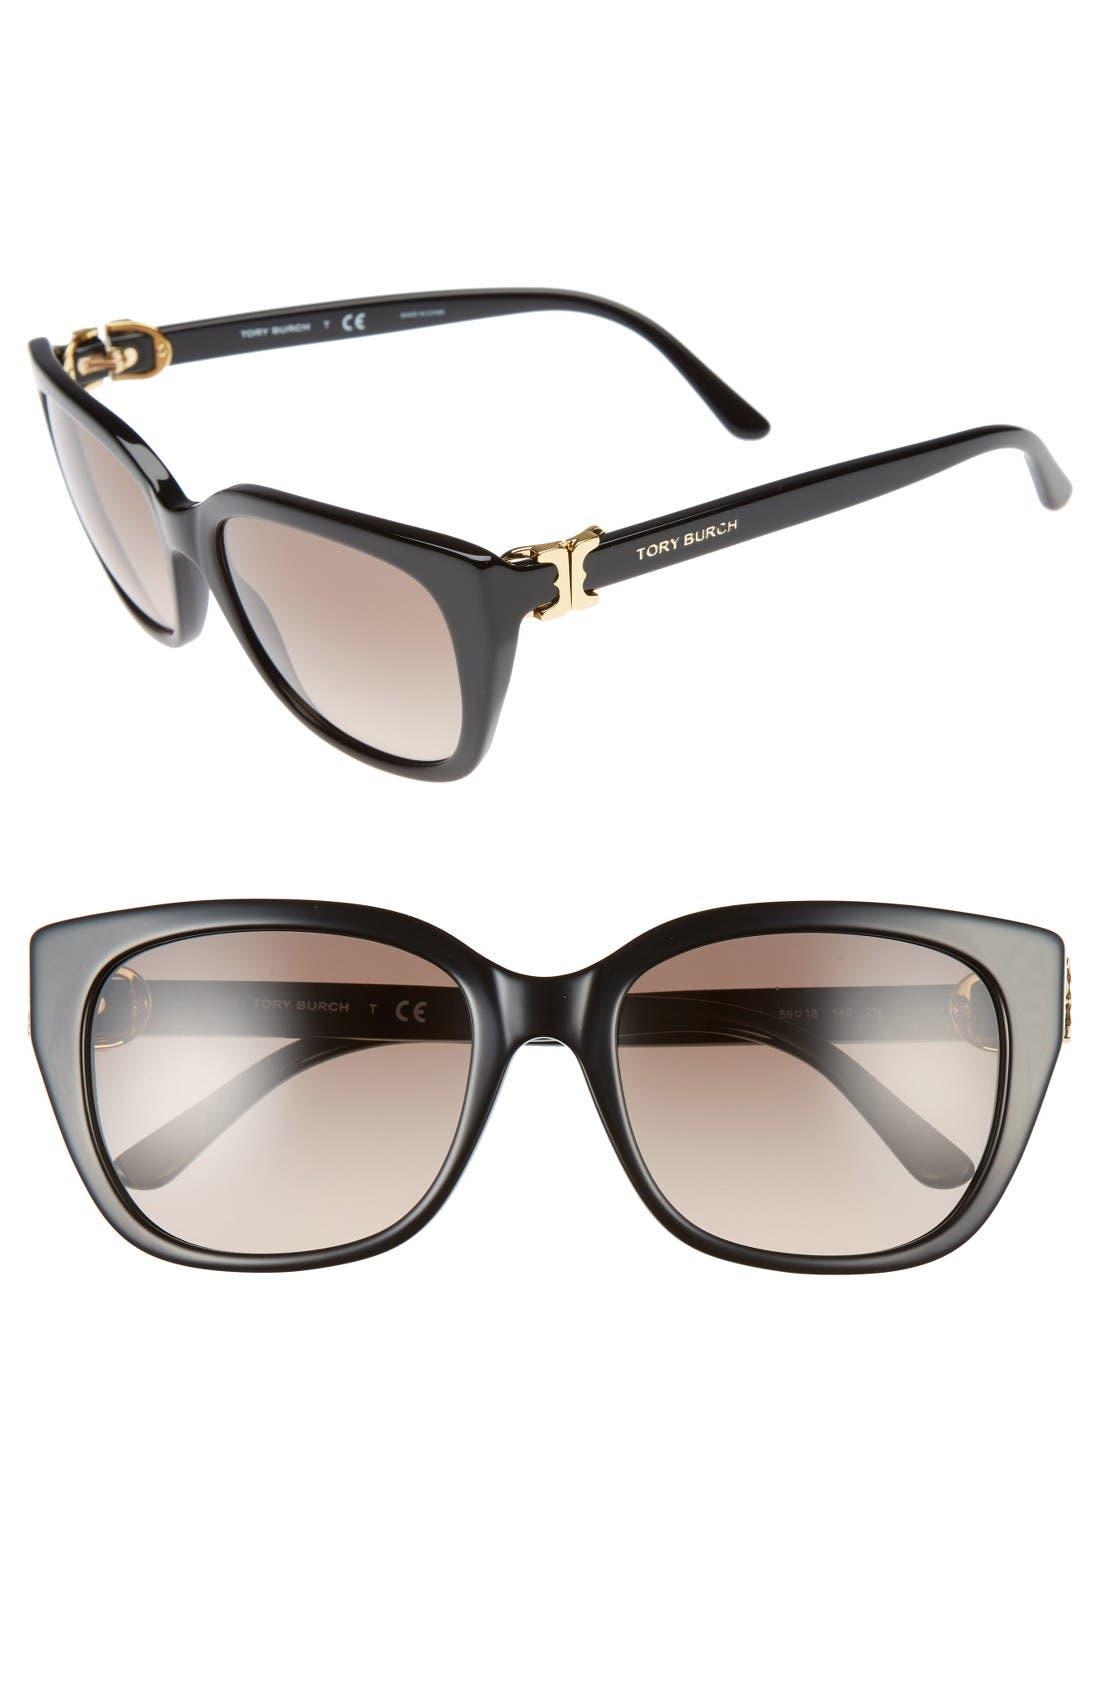 23c9a823a1d54 Tory Burch Sunglasses for Women